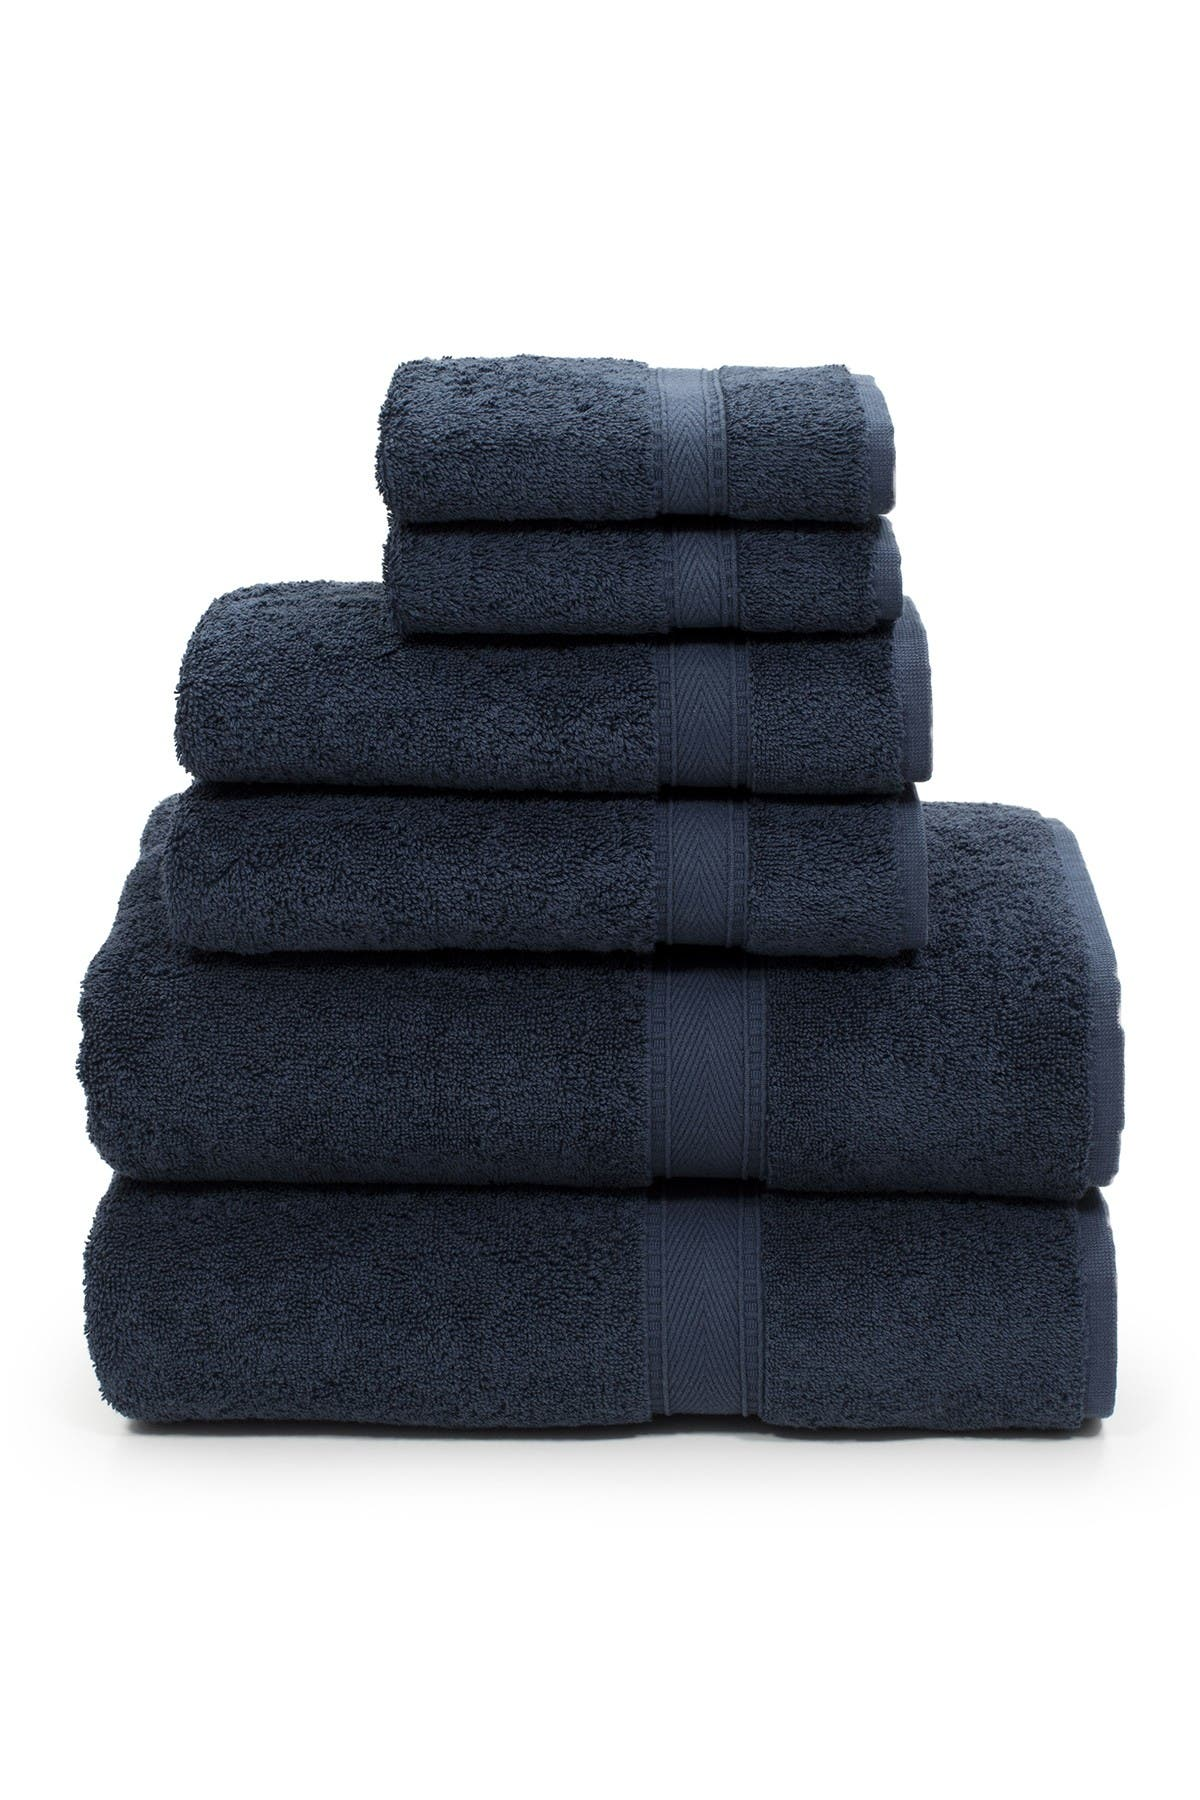 Image of LINUM HOME Sinemis Terry 6-Piece Towel Set - Navy